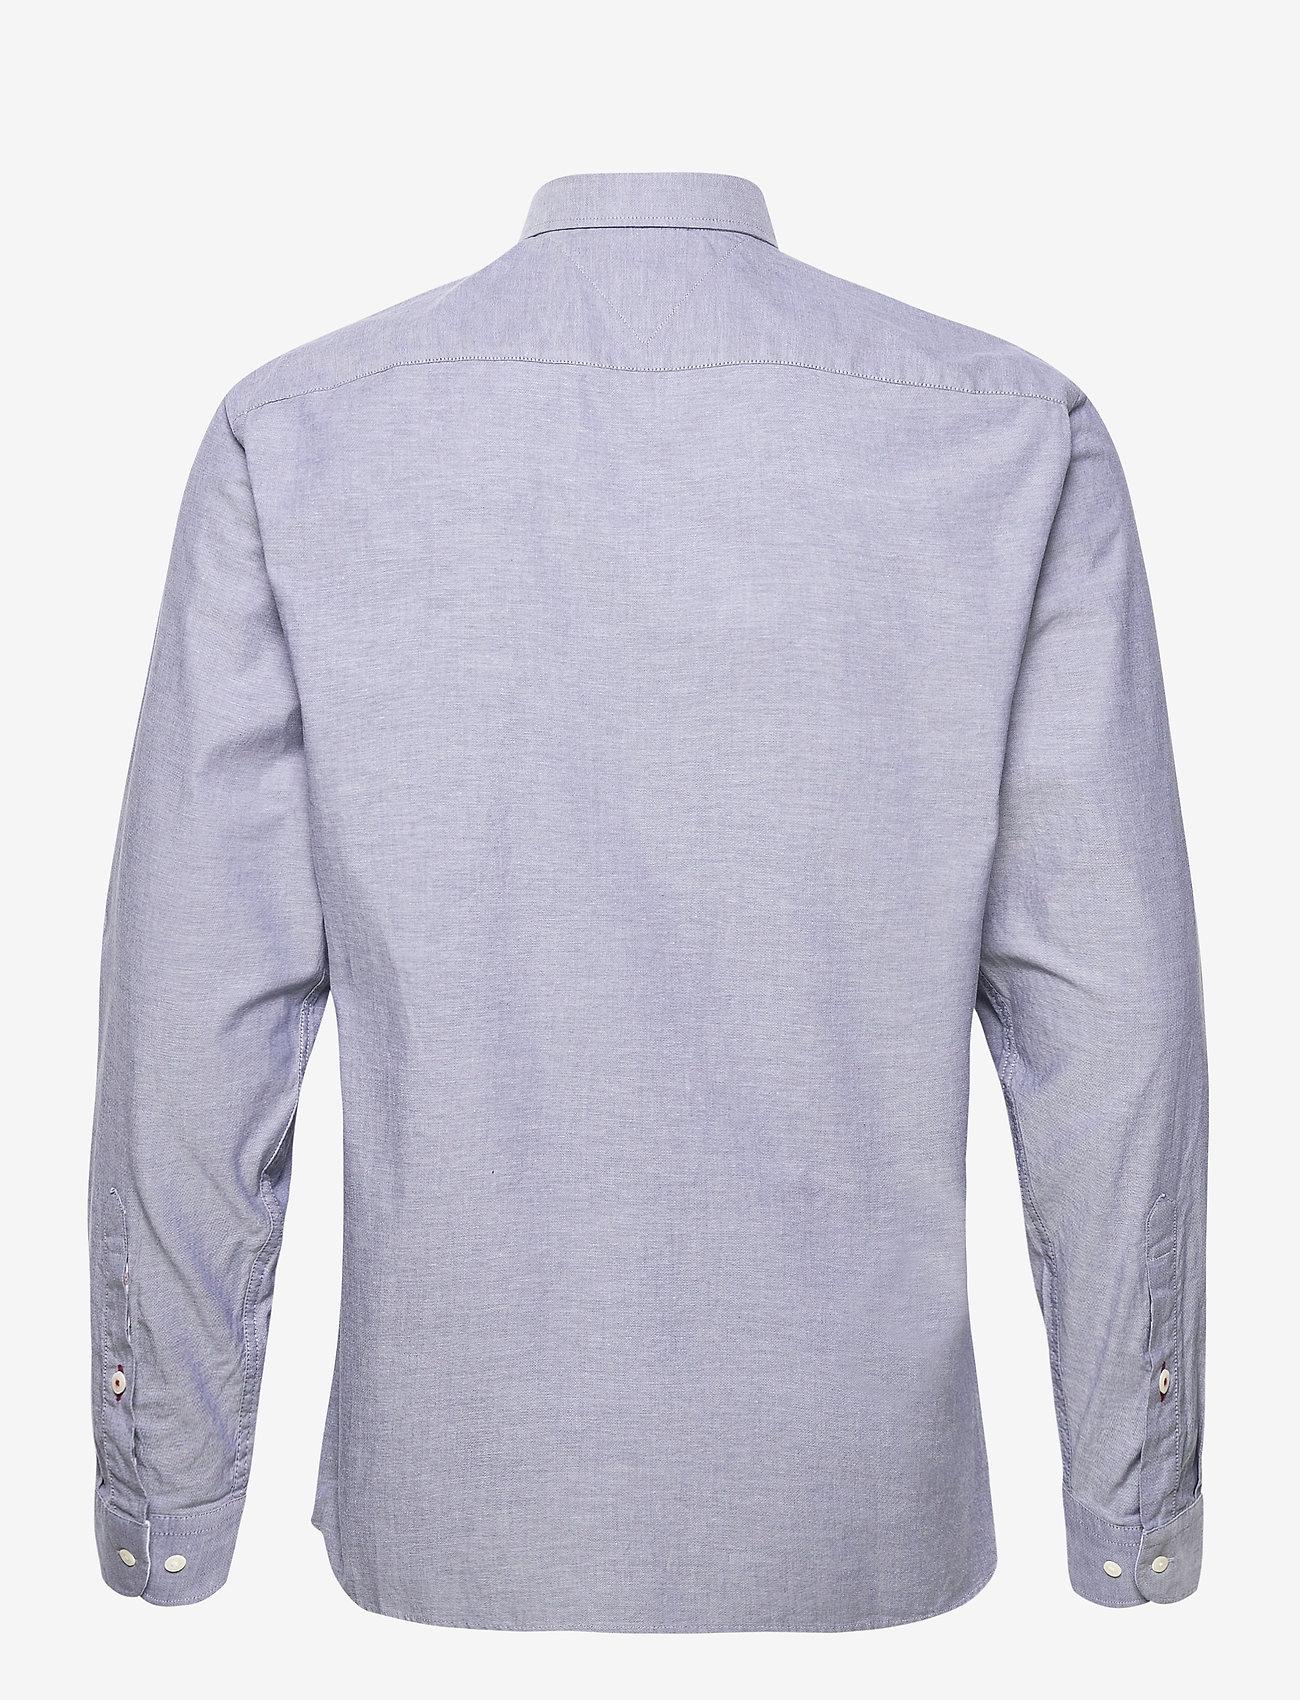 Tommy Hilfiger - FLEX REFINED OXFORD SHIRT - basic shirts - carbon navy - 1